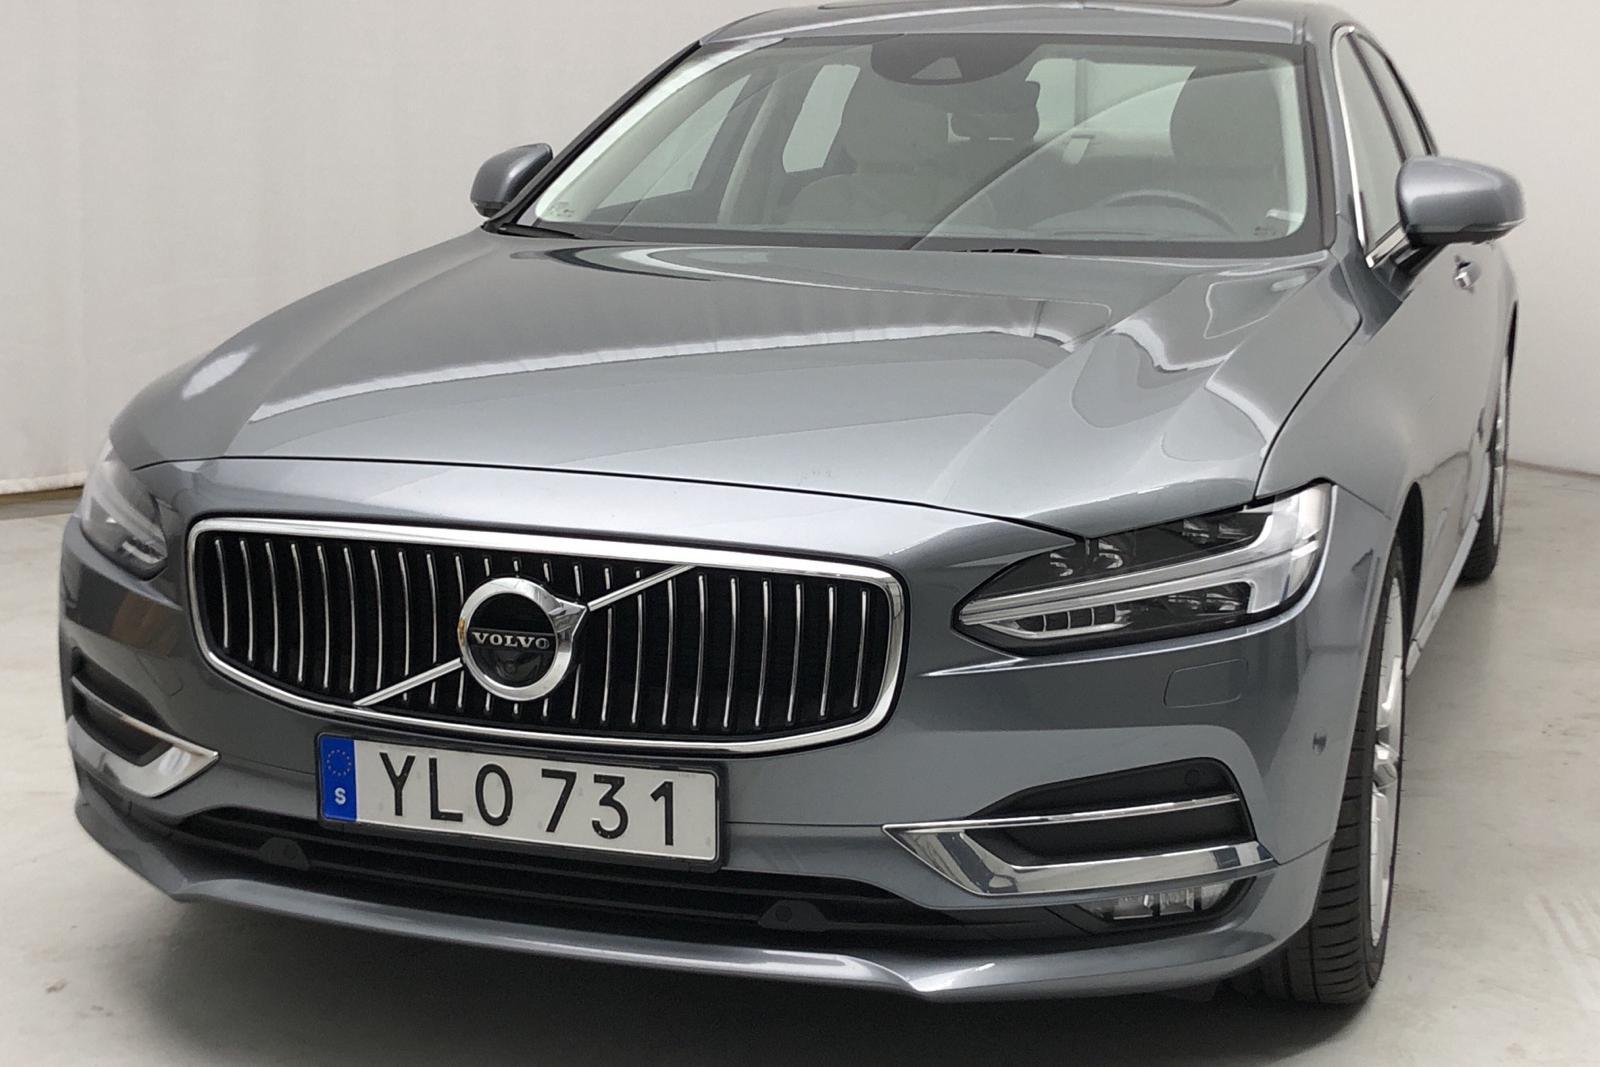 Volvo S90 D5 AWD (235hk) - 8 729 mil - Automat - grå - 2017